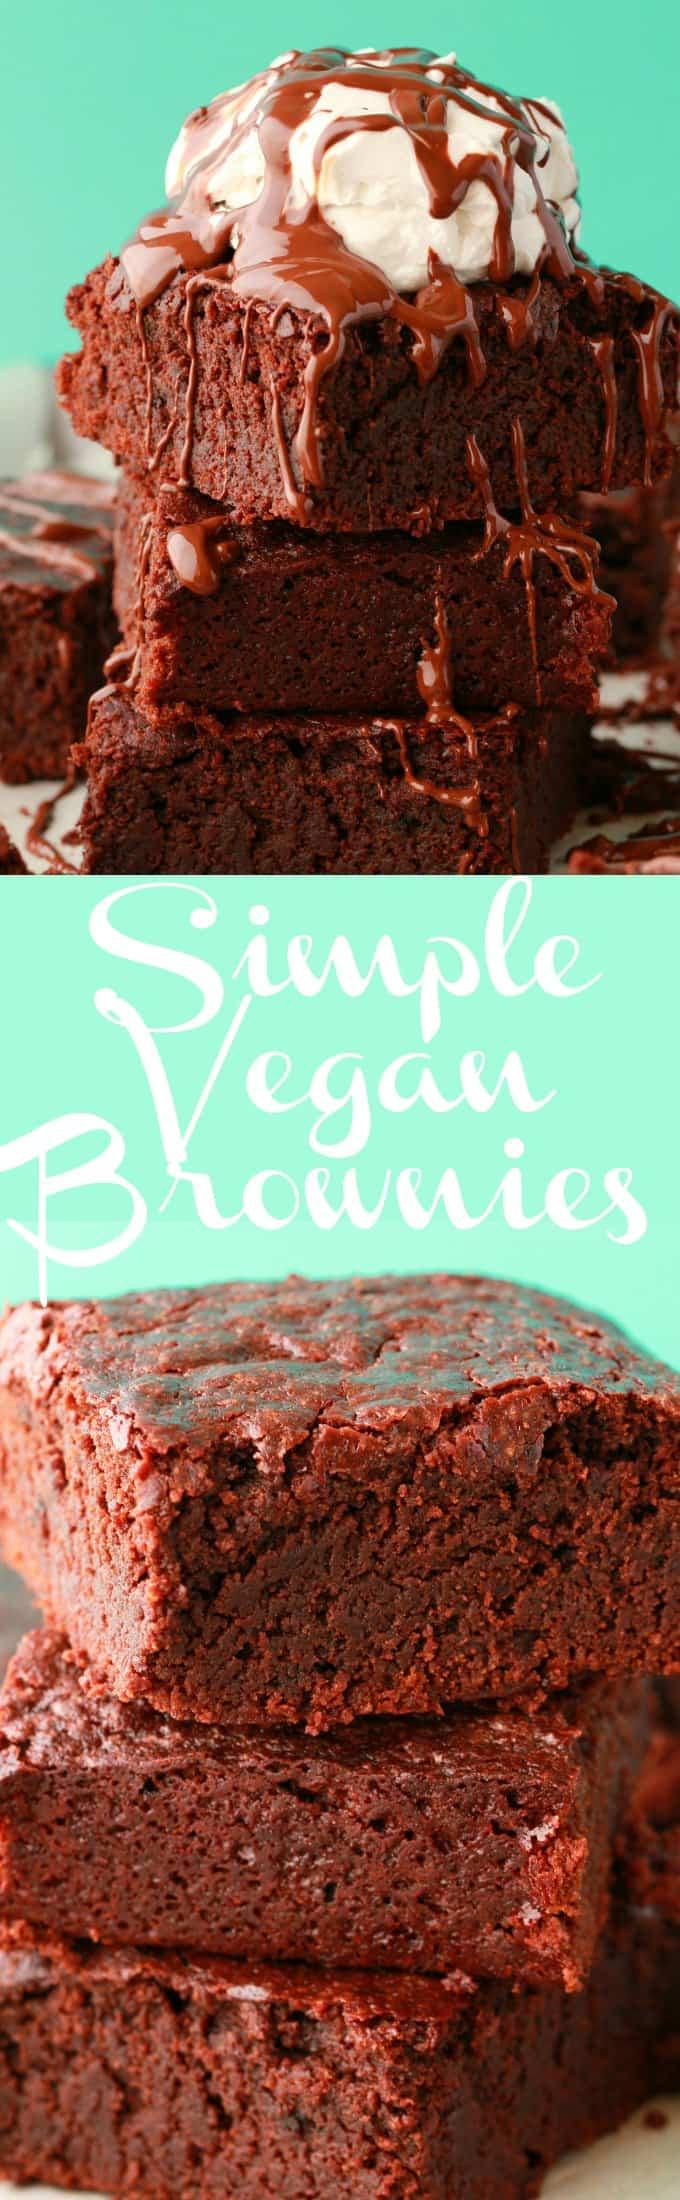 Super moist, fudgy and beautifully textured vegan brownies. Rich, decadent and delightful! Serve with vegan cream or ice cream for a fabulous dessert. | lovingitvegan.com